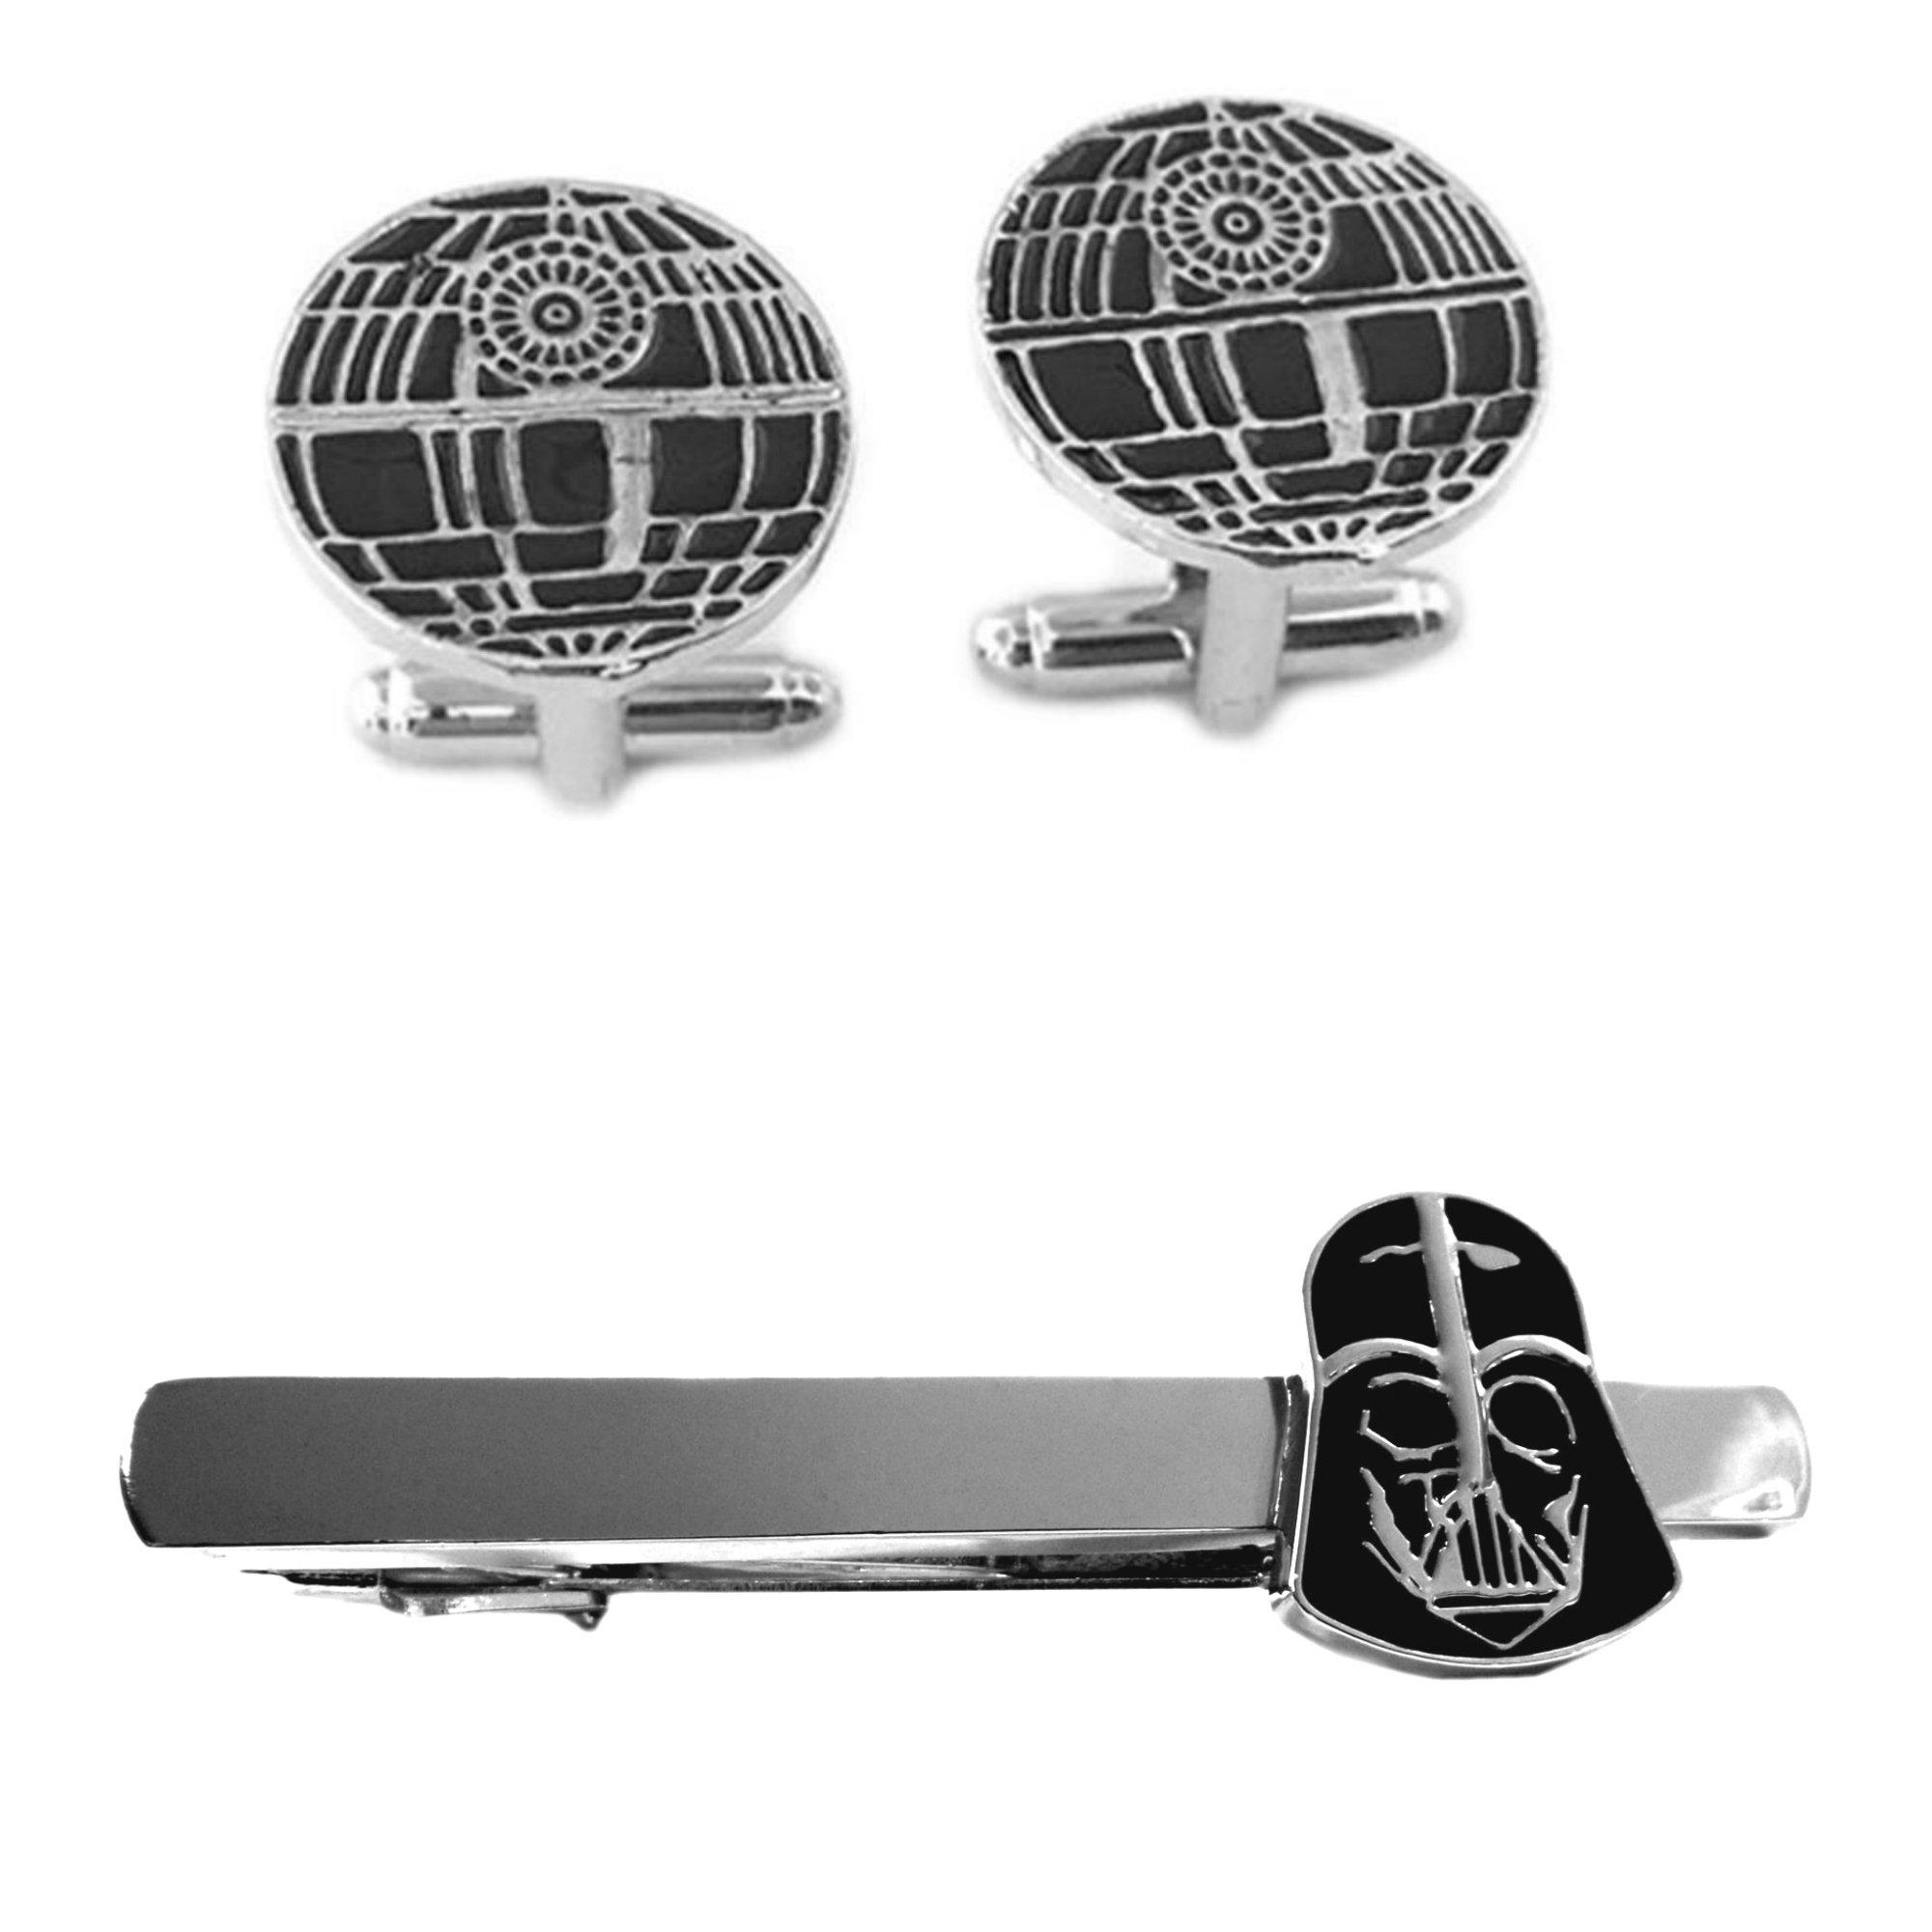 Outlander Death Star Cufflink & Darth Vader Tiebar - New 2018 Star Wars Movies - Set of 2 Wedding Logo w/Gift Box